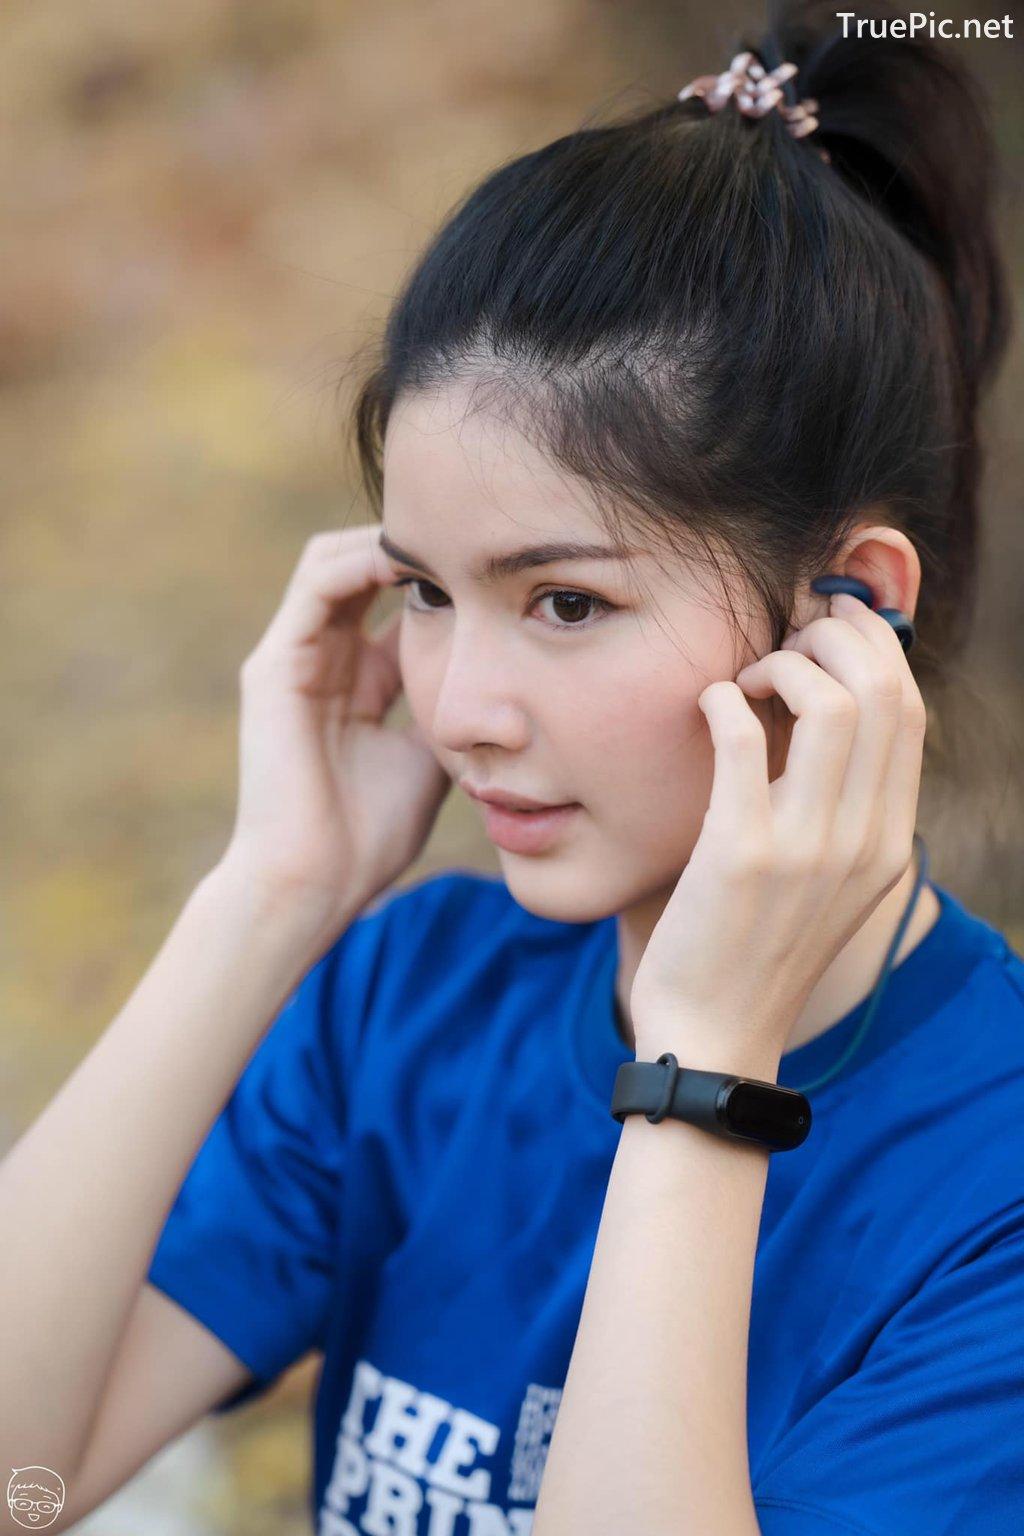 Image Thailand Model - Nuttacha Chayangkanont - Fun & Run - TruePic.net - Picture-8